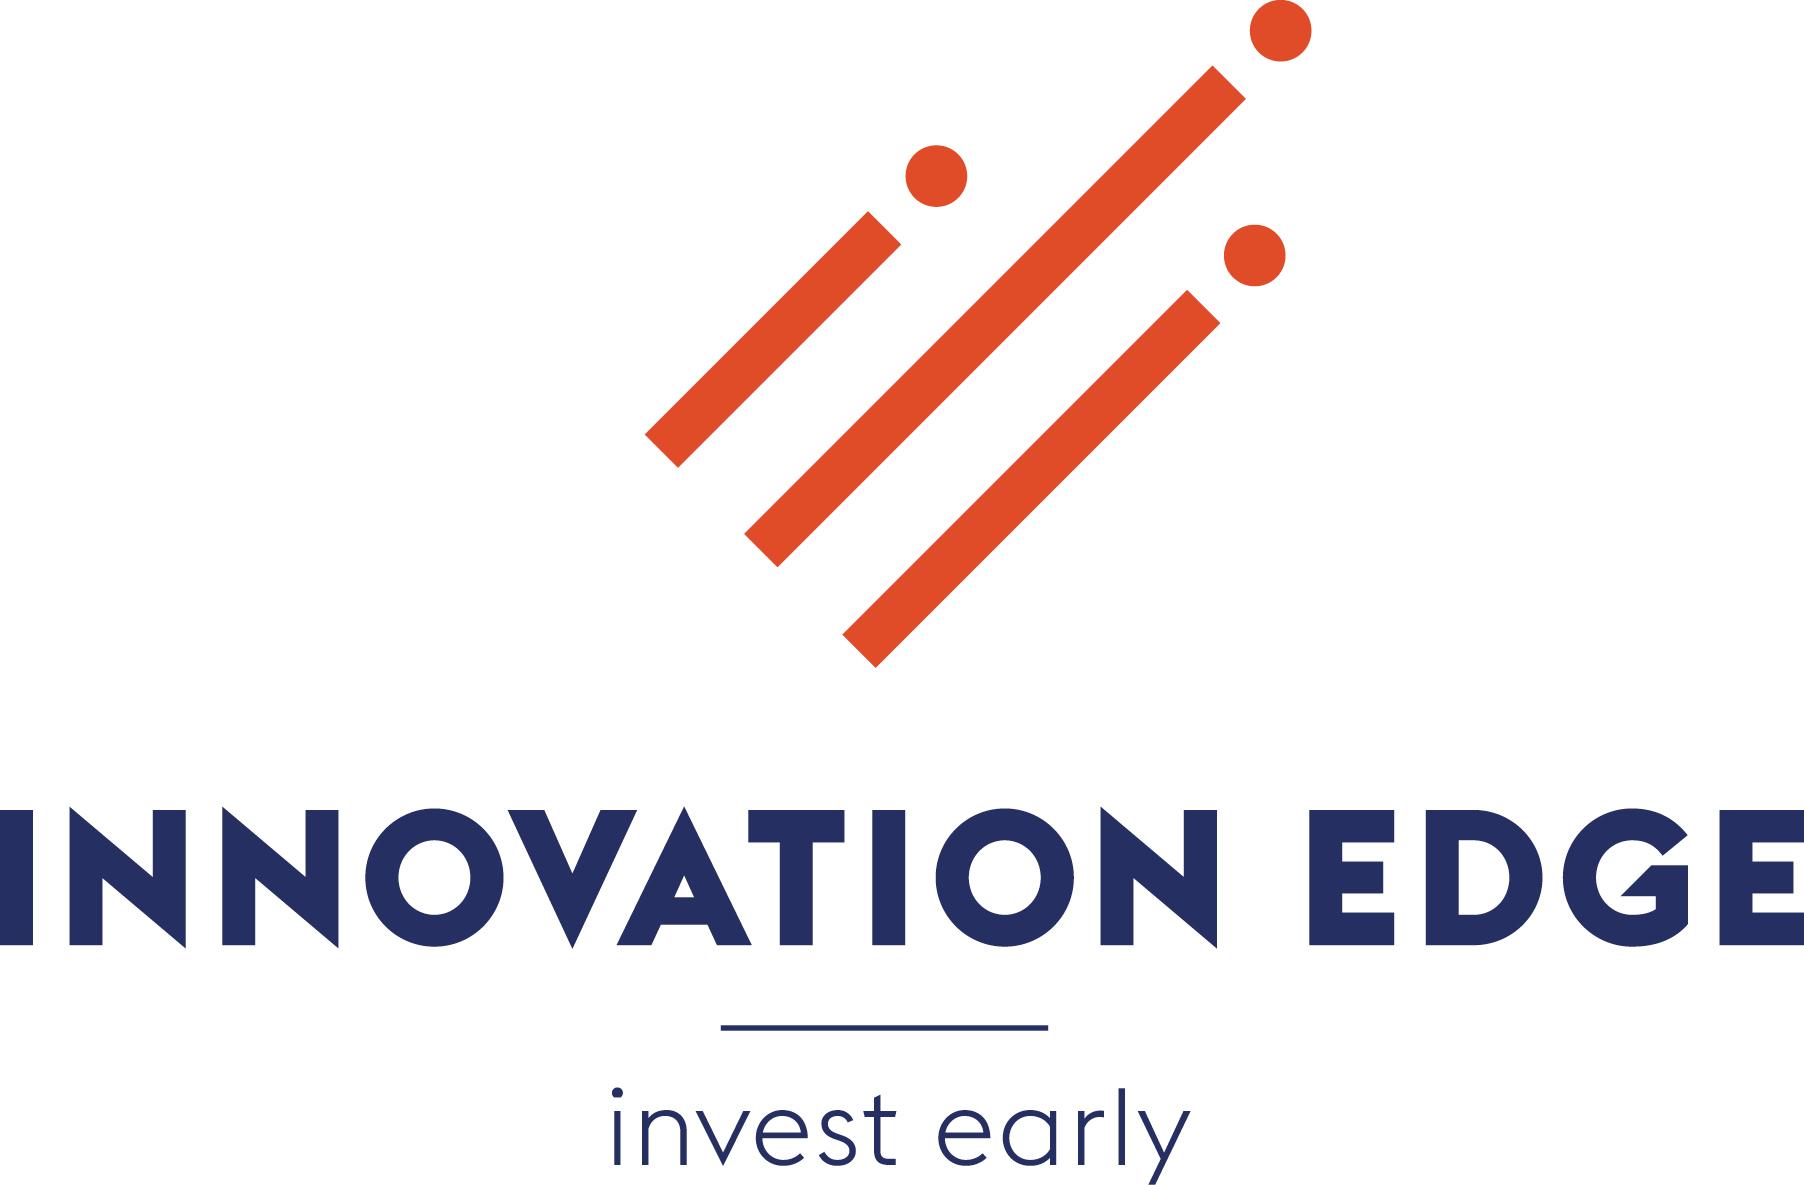 Innovation Edge